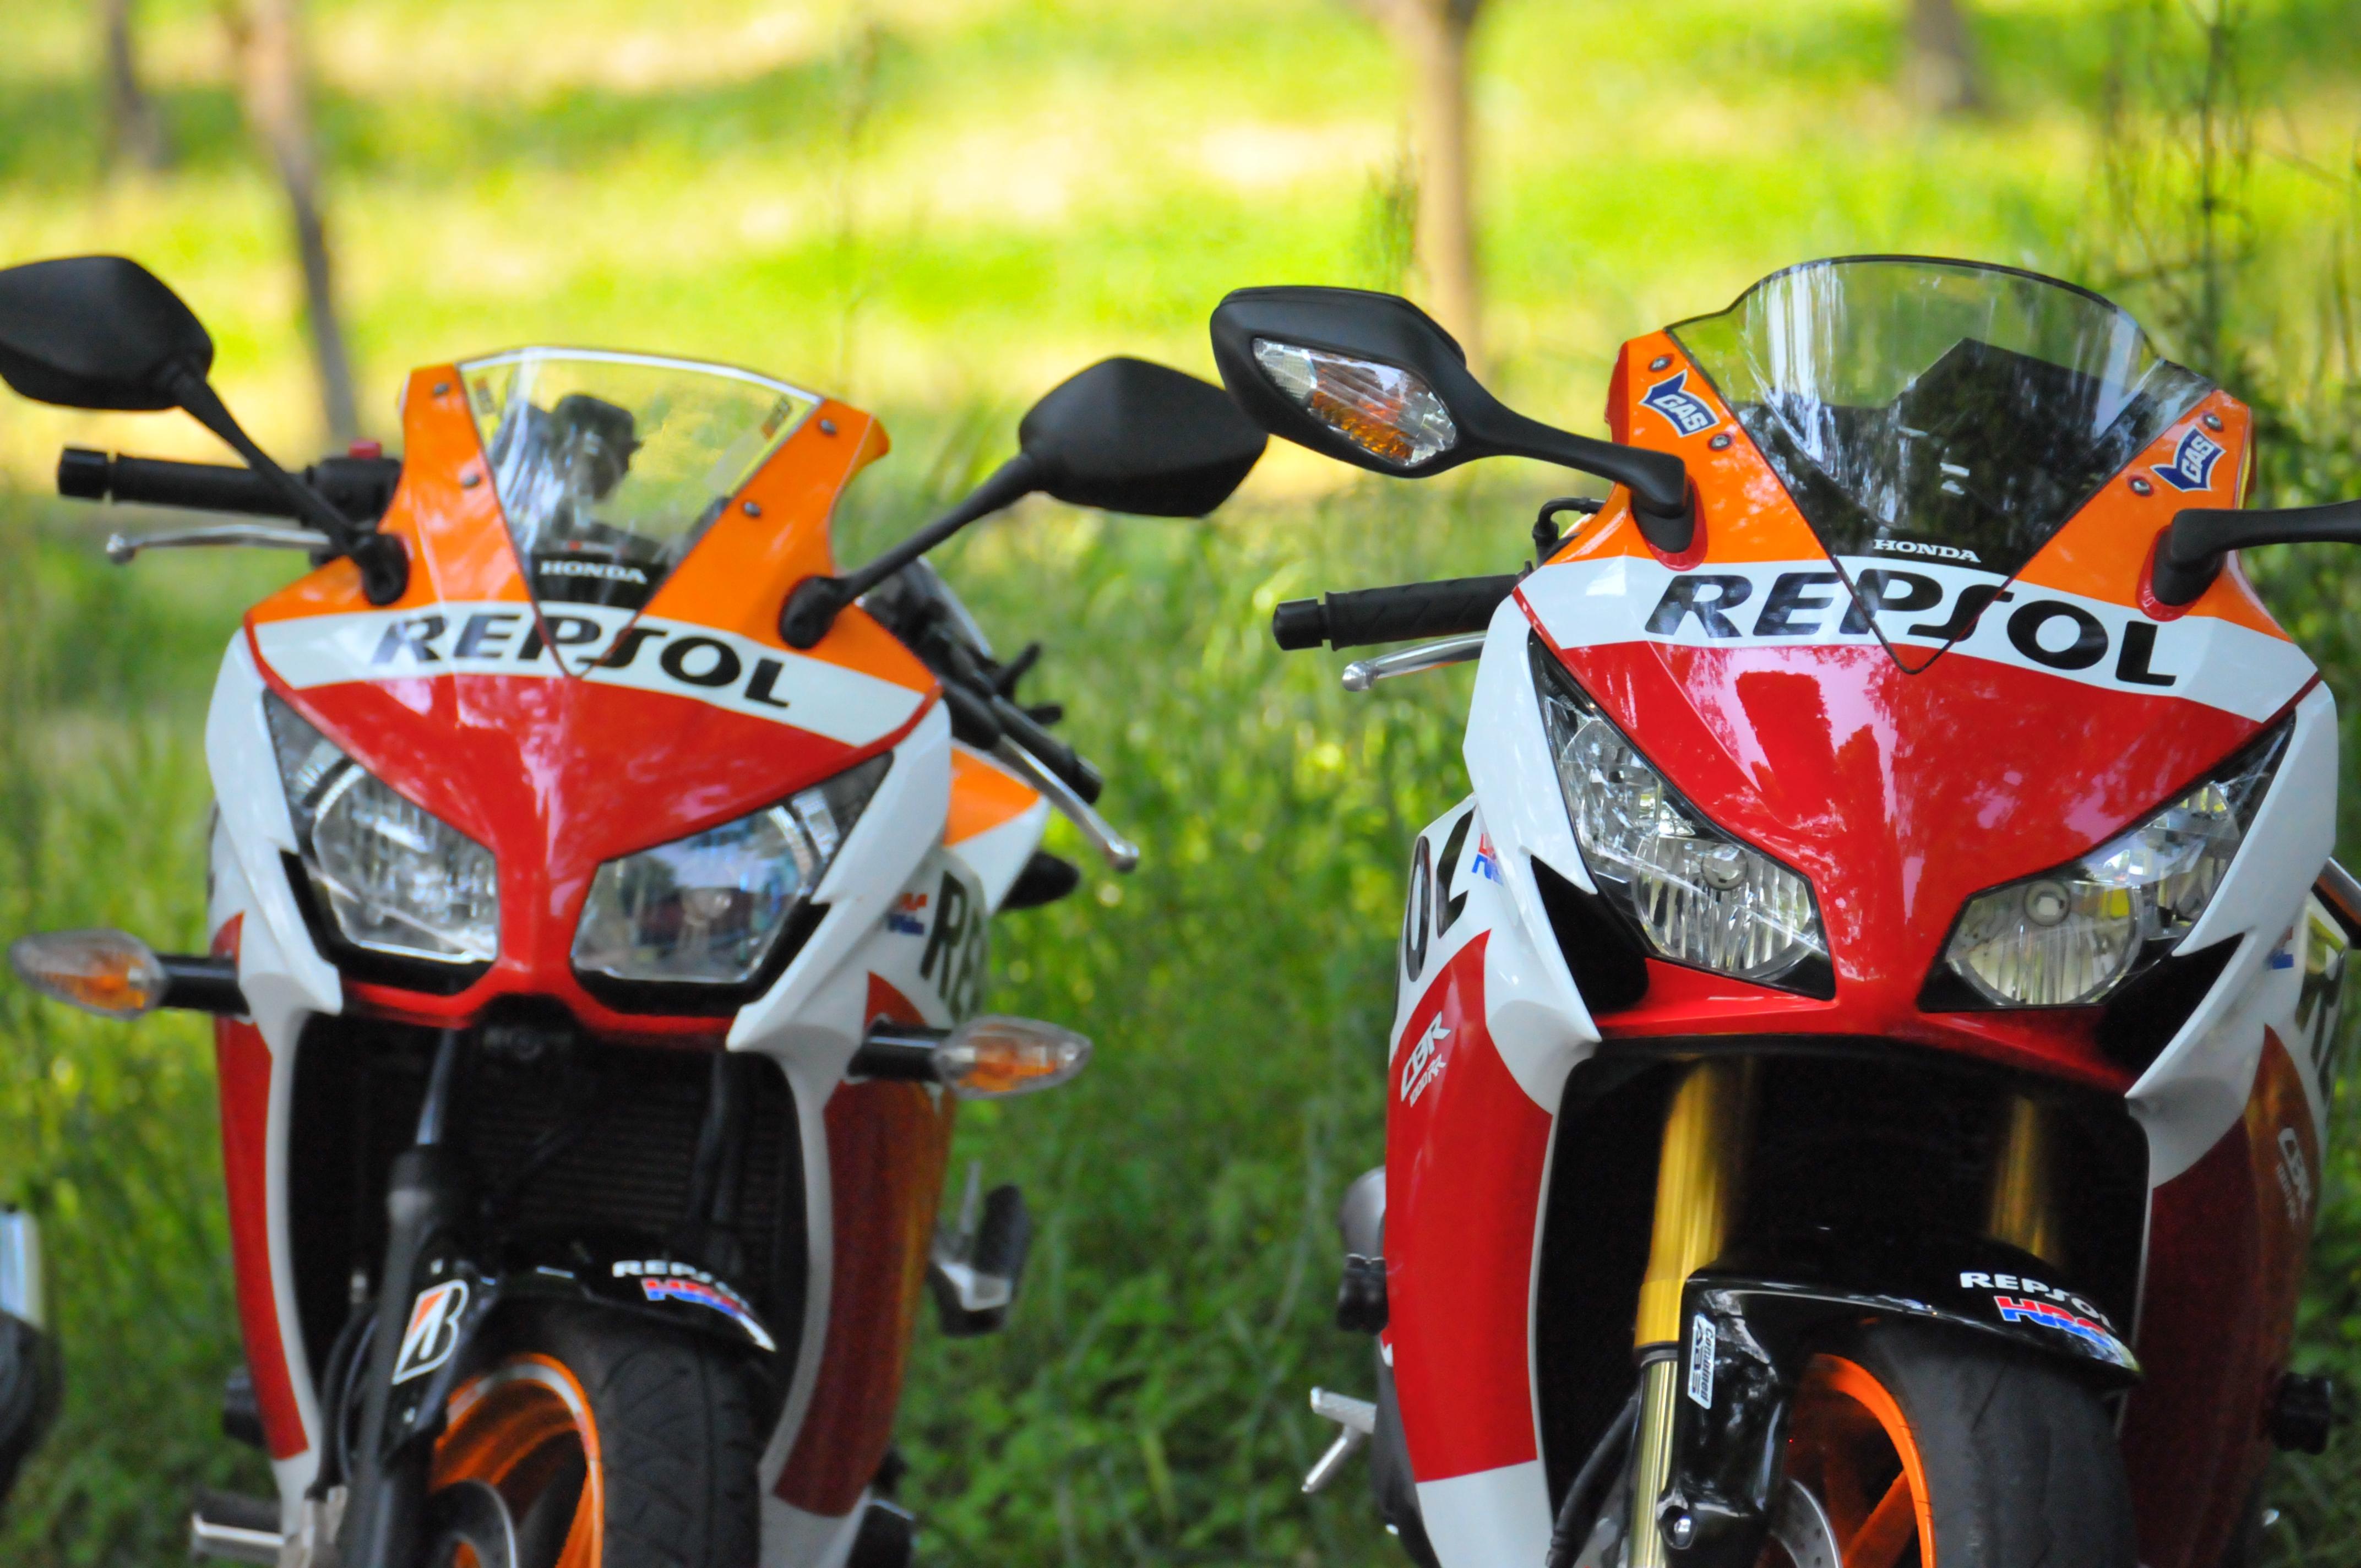 CBR250RとCBR1000RR